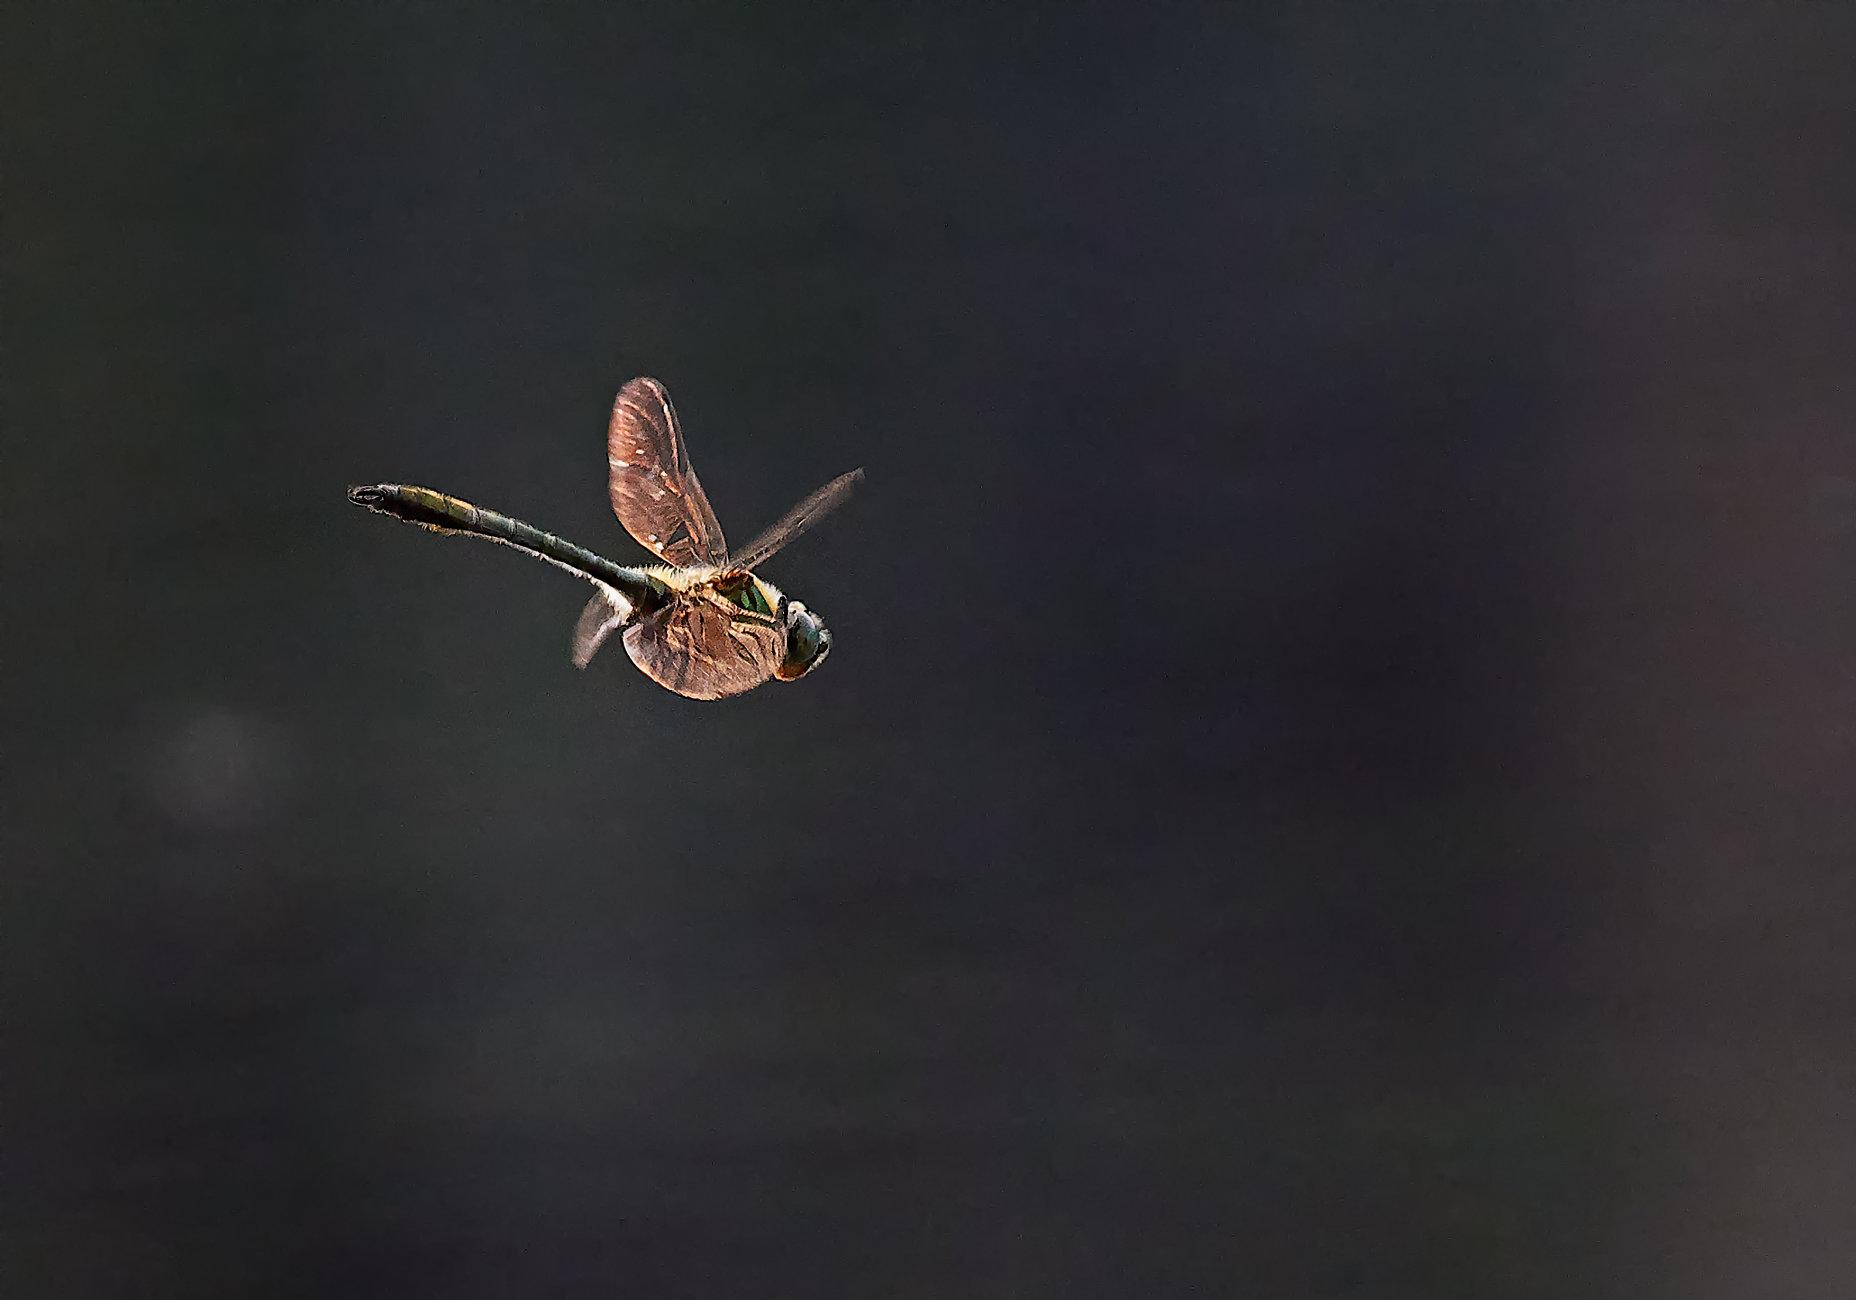 Dragonfly in Espoo